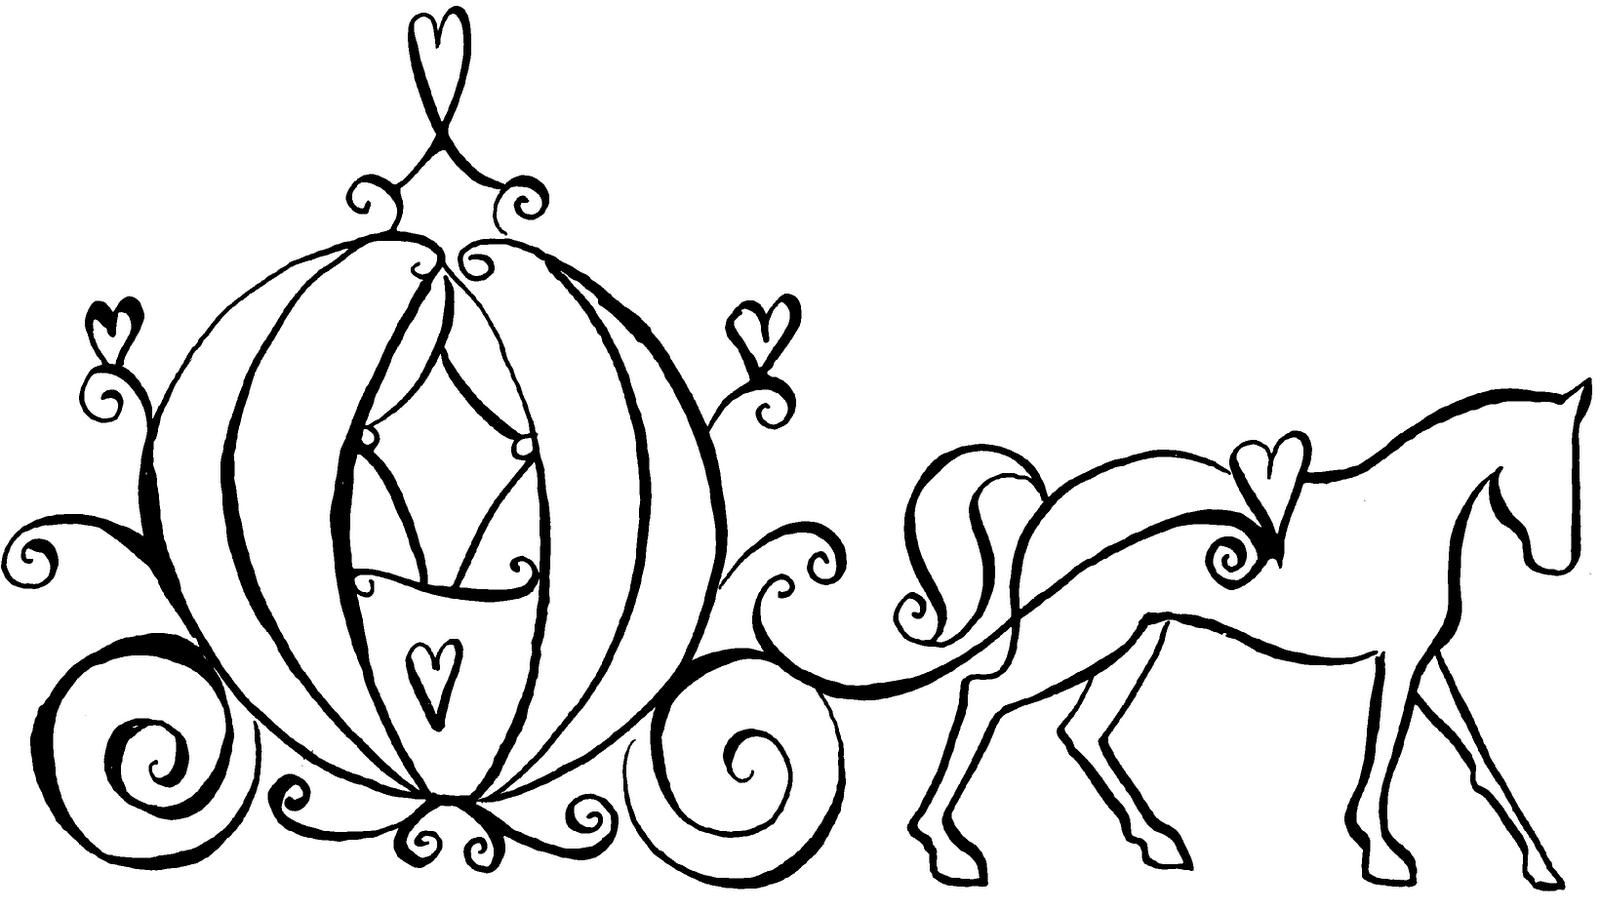 Drawn pumpkin cinderella pumpkin Pumpkin Silhouette Silhouette Outline With